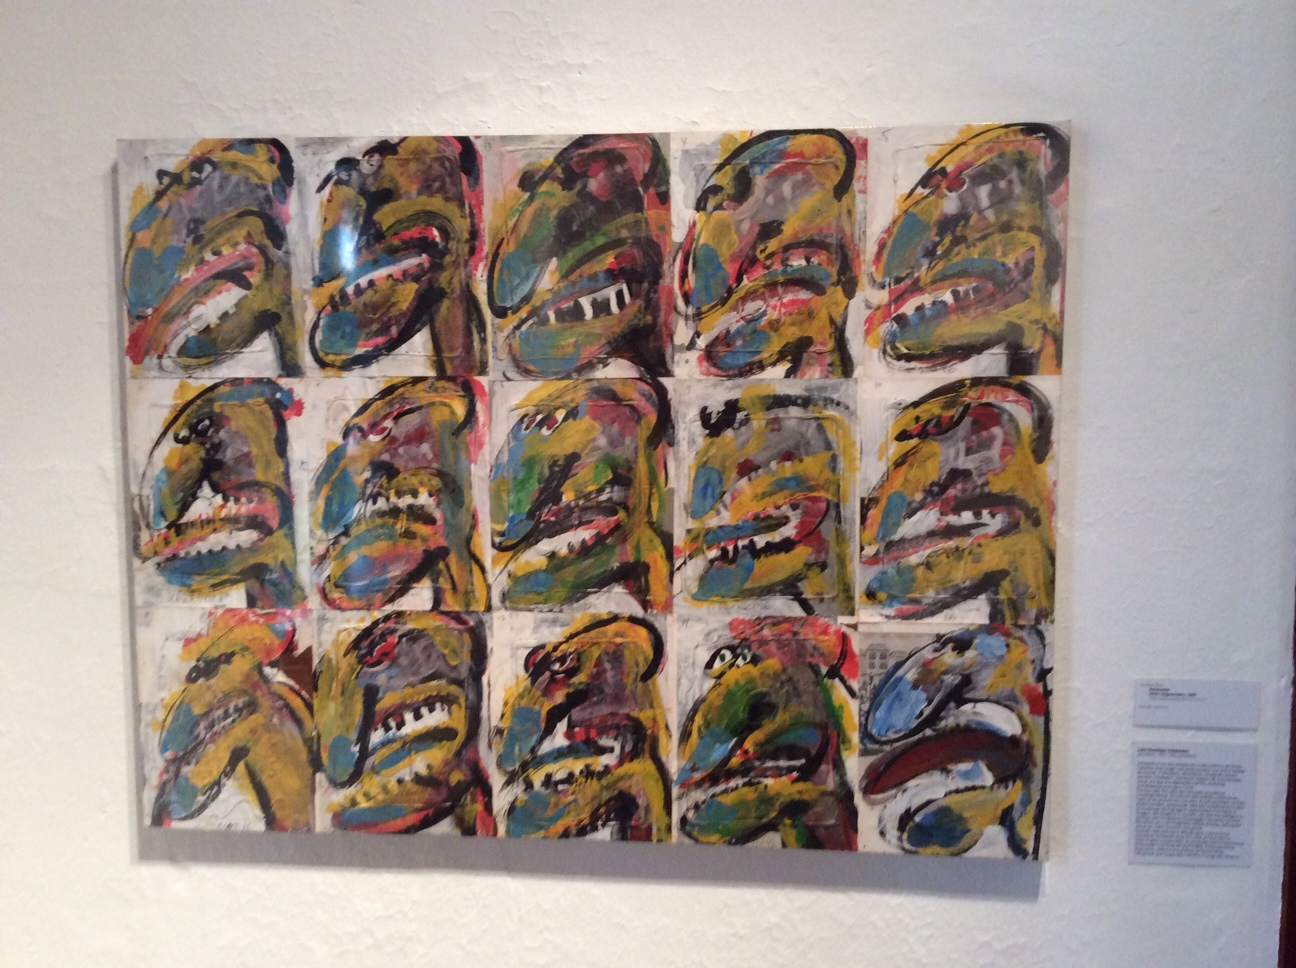 SCHWANKE  Série Linguarudos, 1986  Técnica mista sobre papel  90,5 x 119 cm  Acervo do Museu de Arte de Joinville